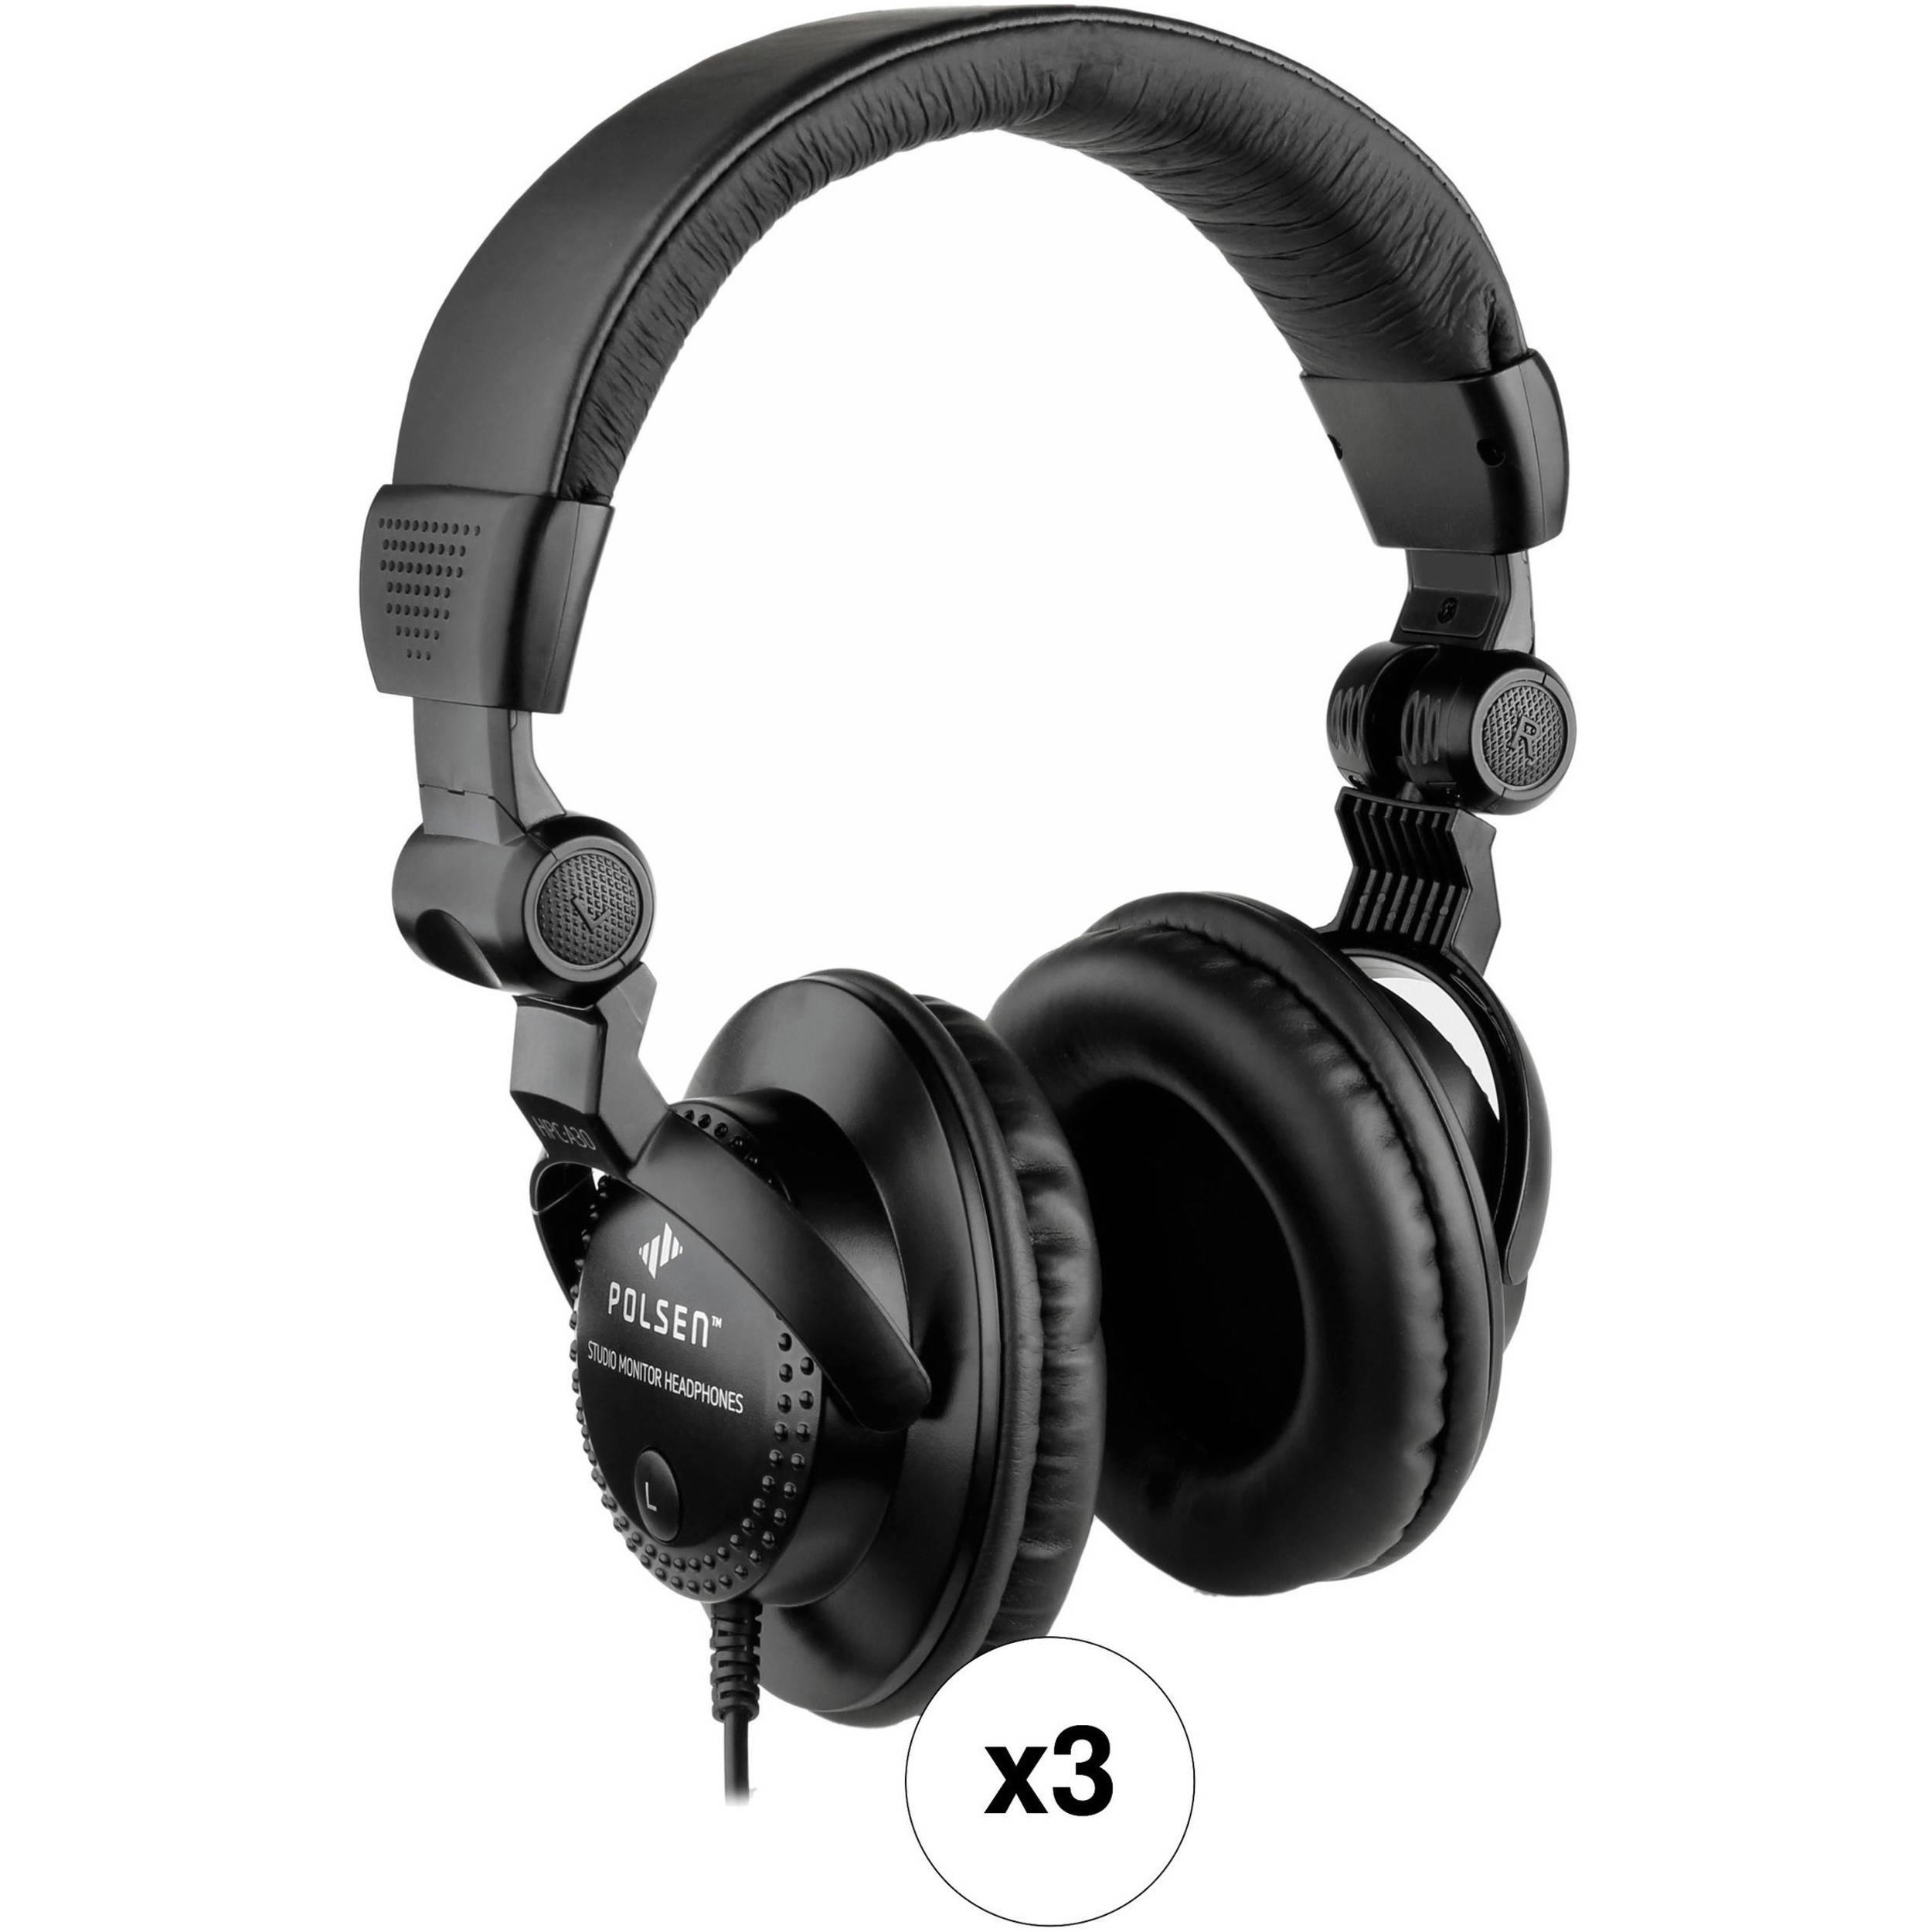 polsen hpc a30 closed back studio monitor headphones hpc a30k. Black Bedroom Furniture Sets. Home Design Ideas